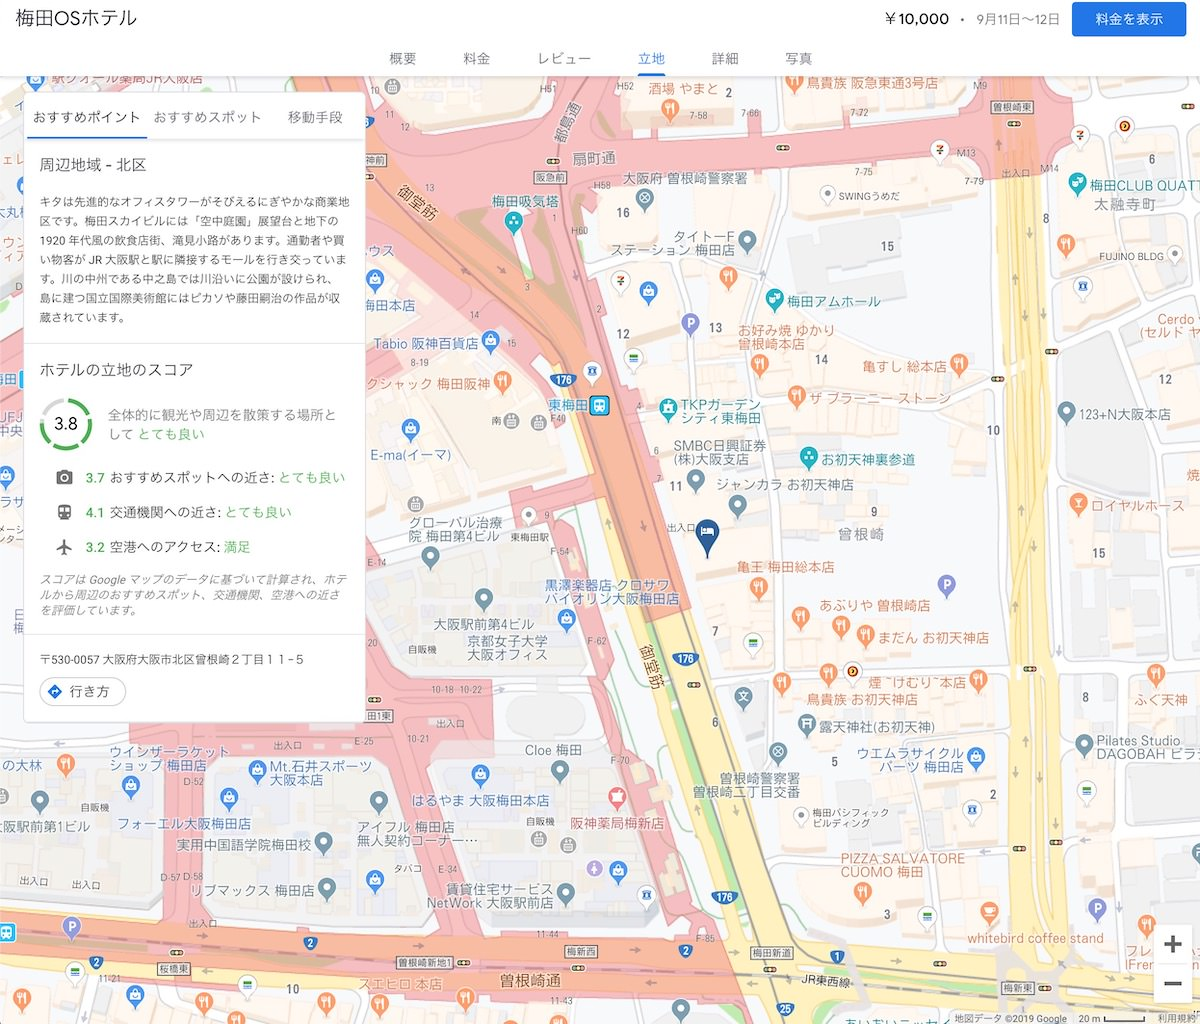 google-hotel-search_9